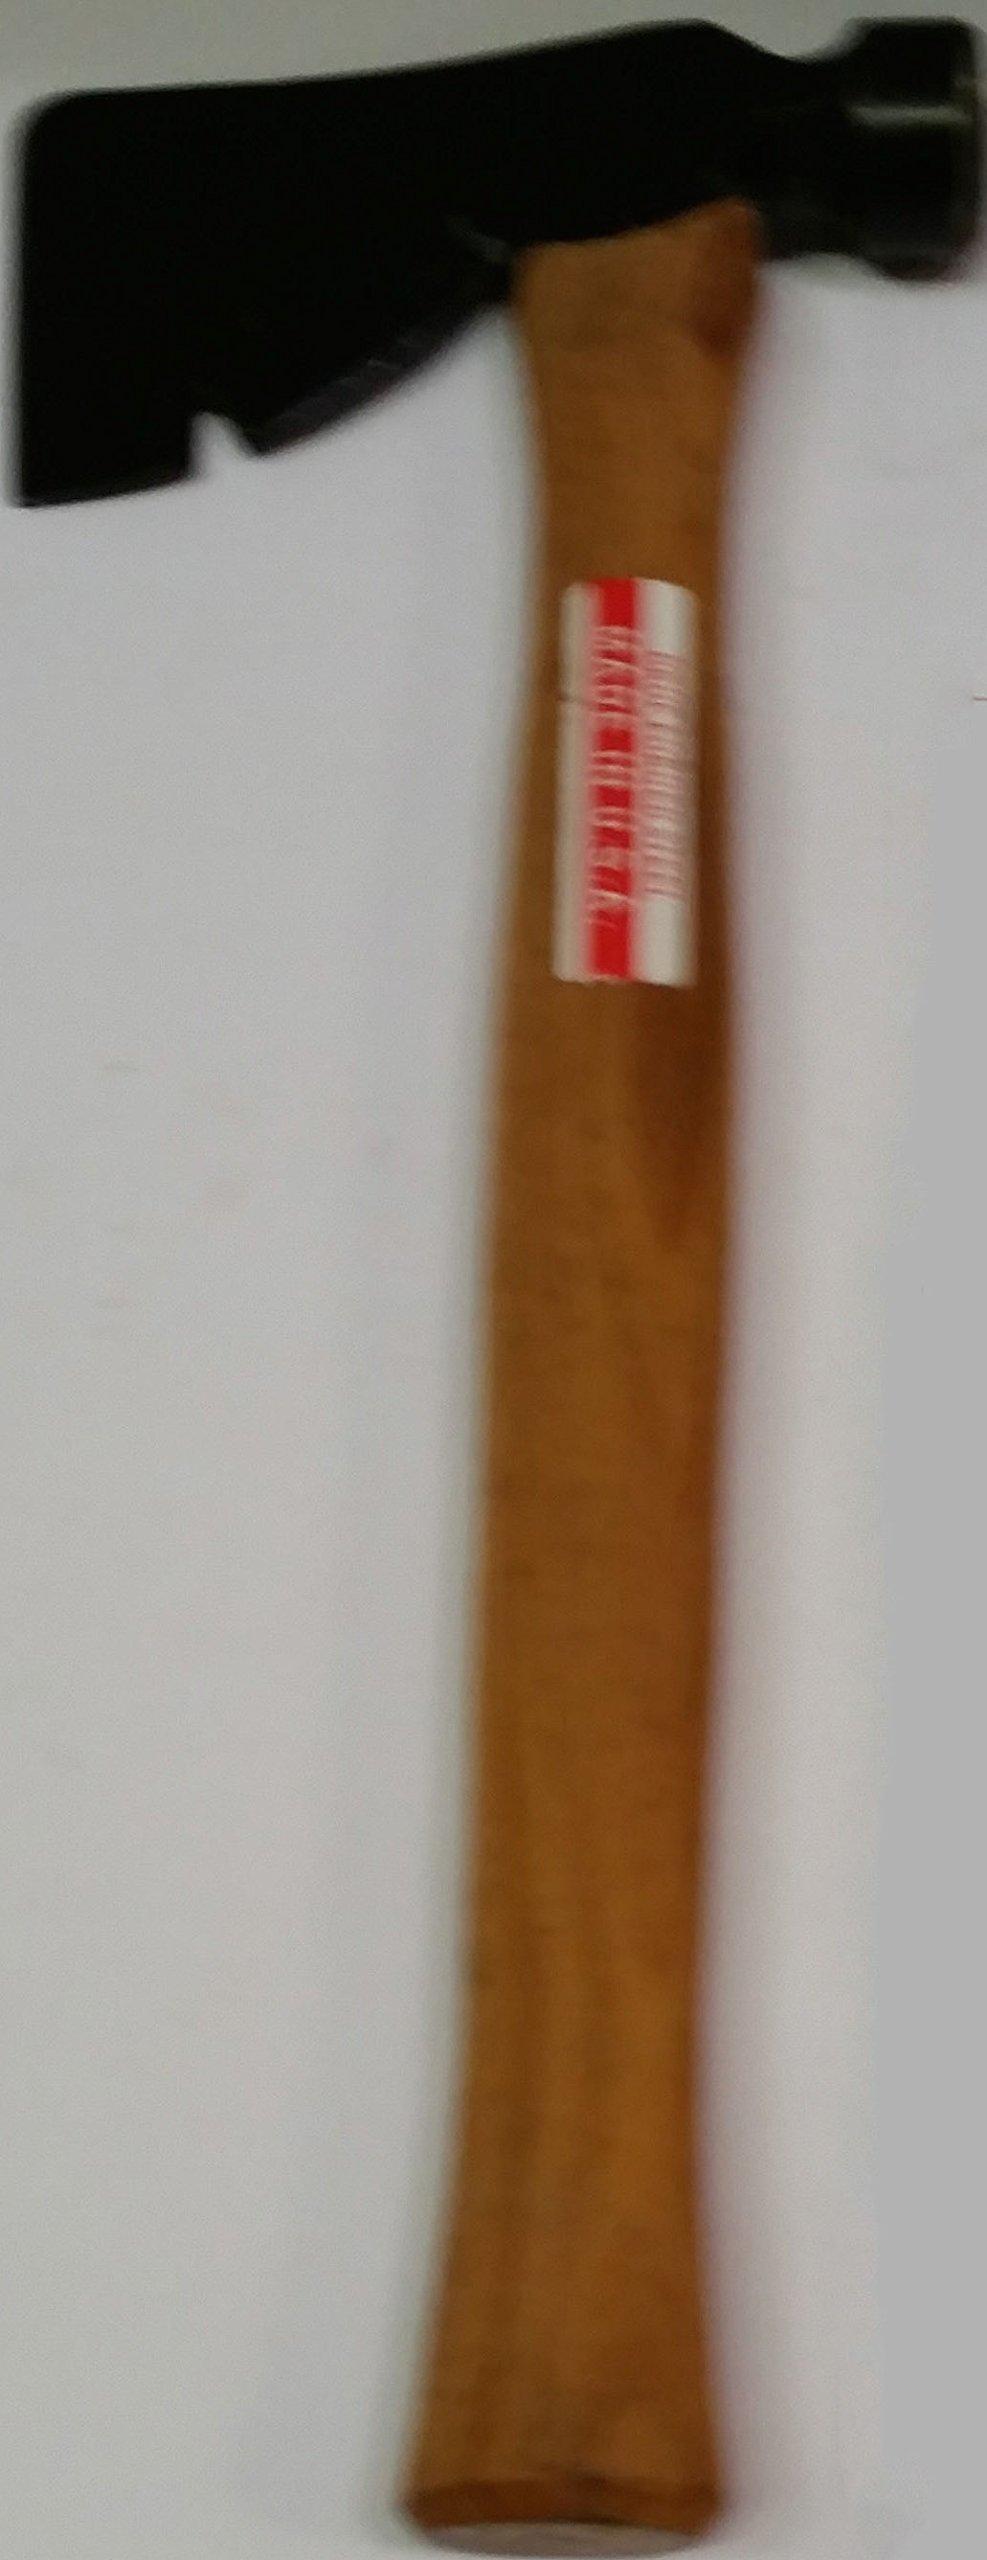 "22 Ounce Carpenter Half Hatch - USA - Hickory Handle 18"" Long"